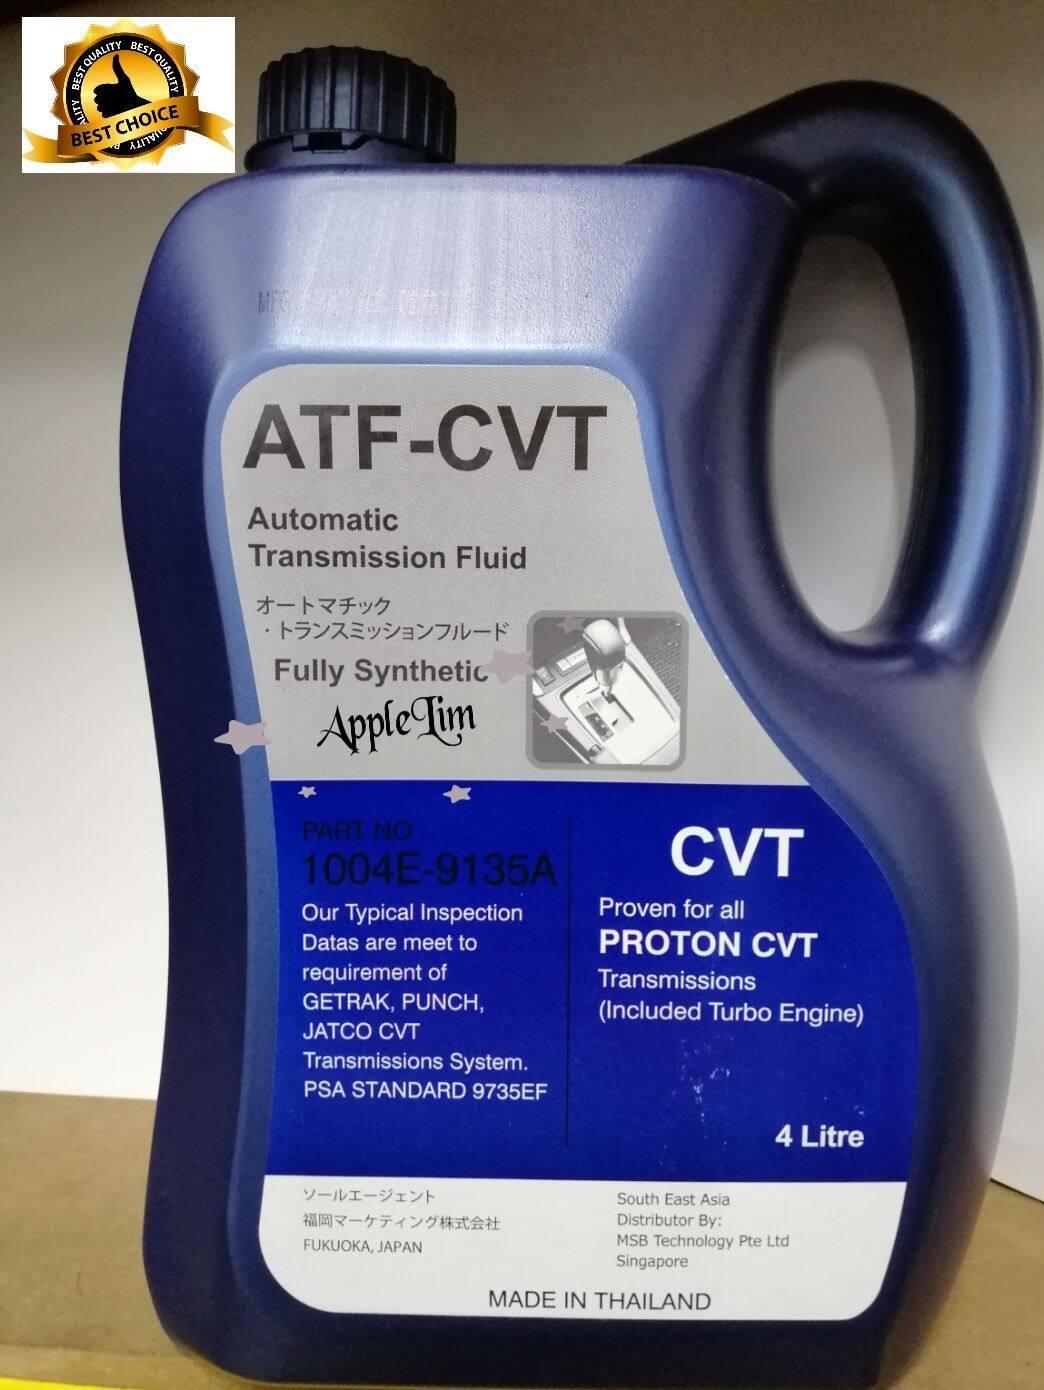 Fukuoka Auto Transmission Fluid Atf Cvt For Proton Cvt Saga Blm Flx Preve 4 Liter Lazada